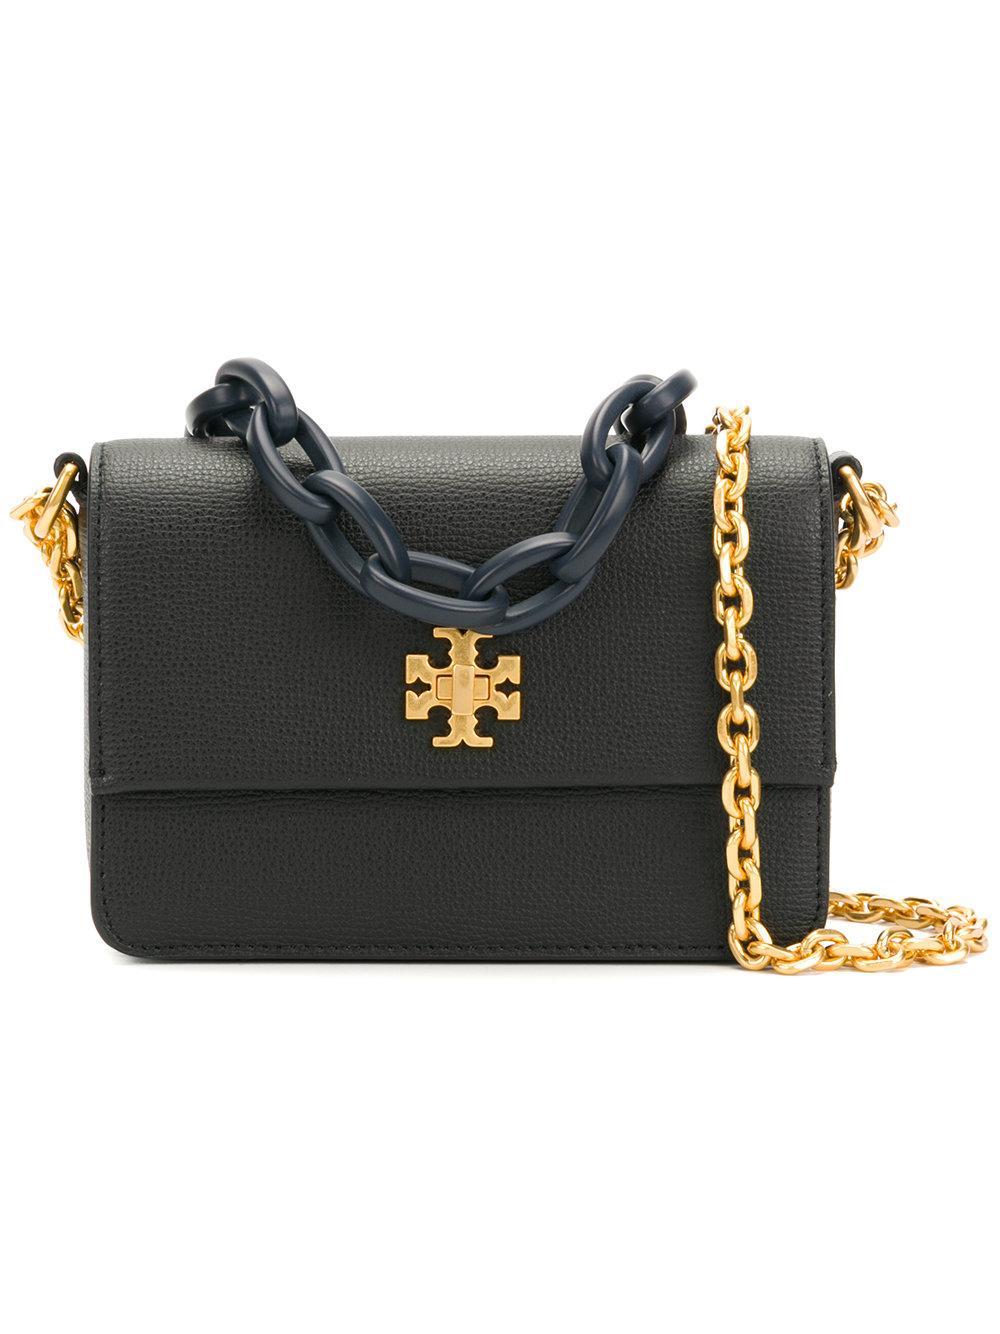 8fa733bace565 Tory Burch Kira Mini Pebbled-Leather Cross-Body Bag In Black